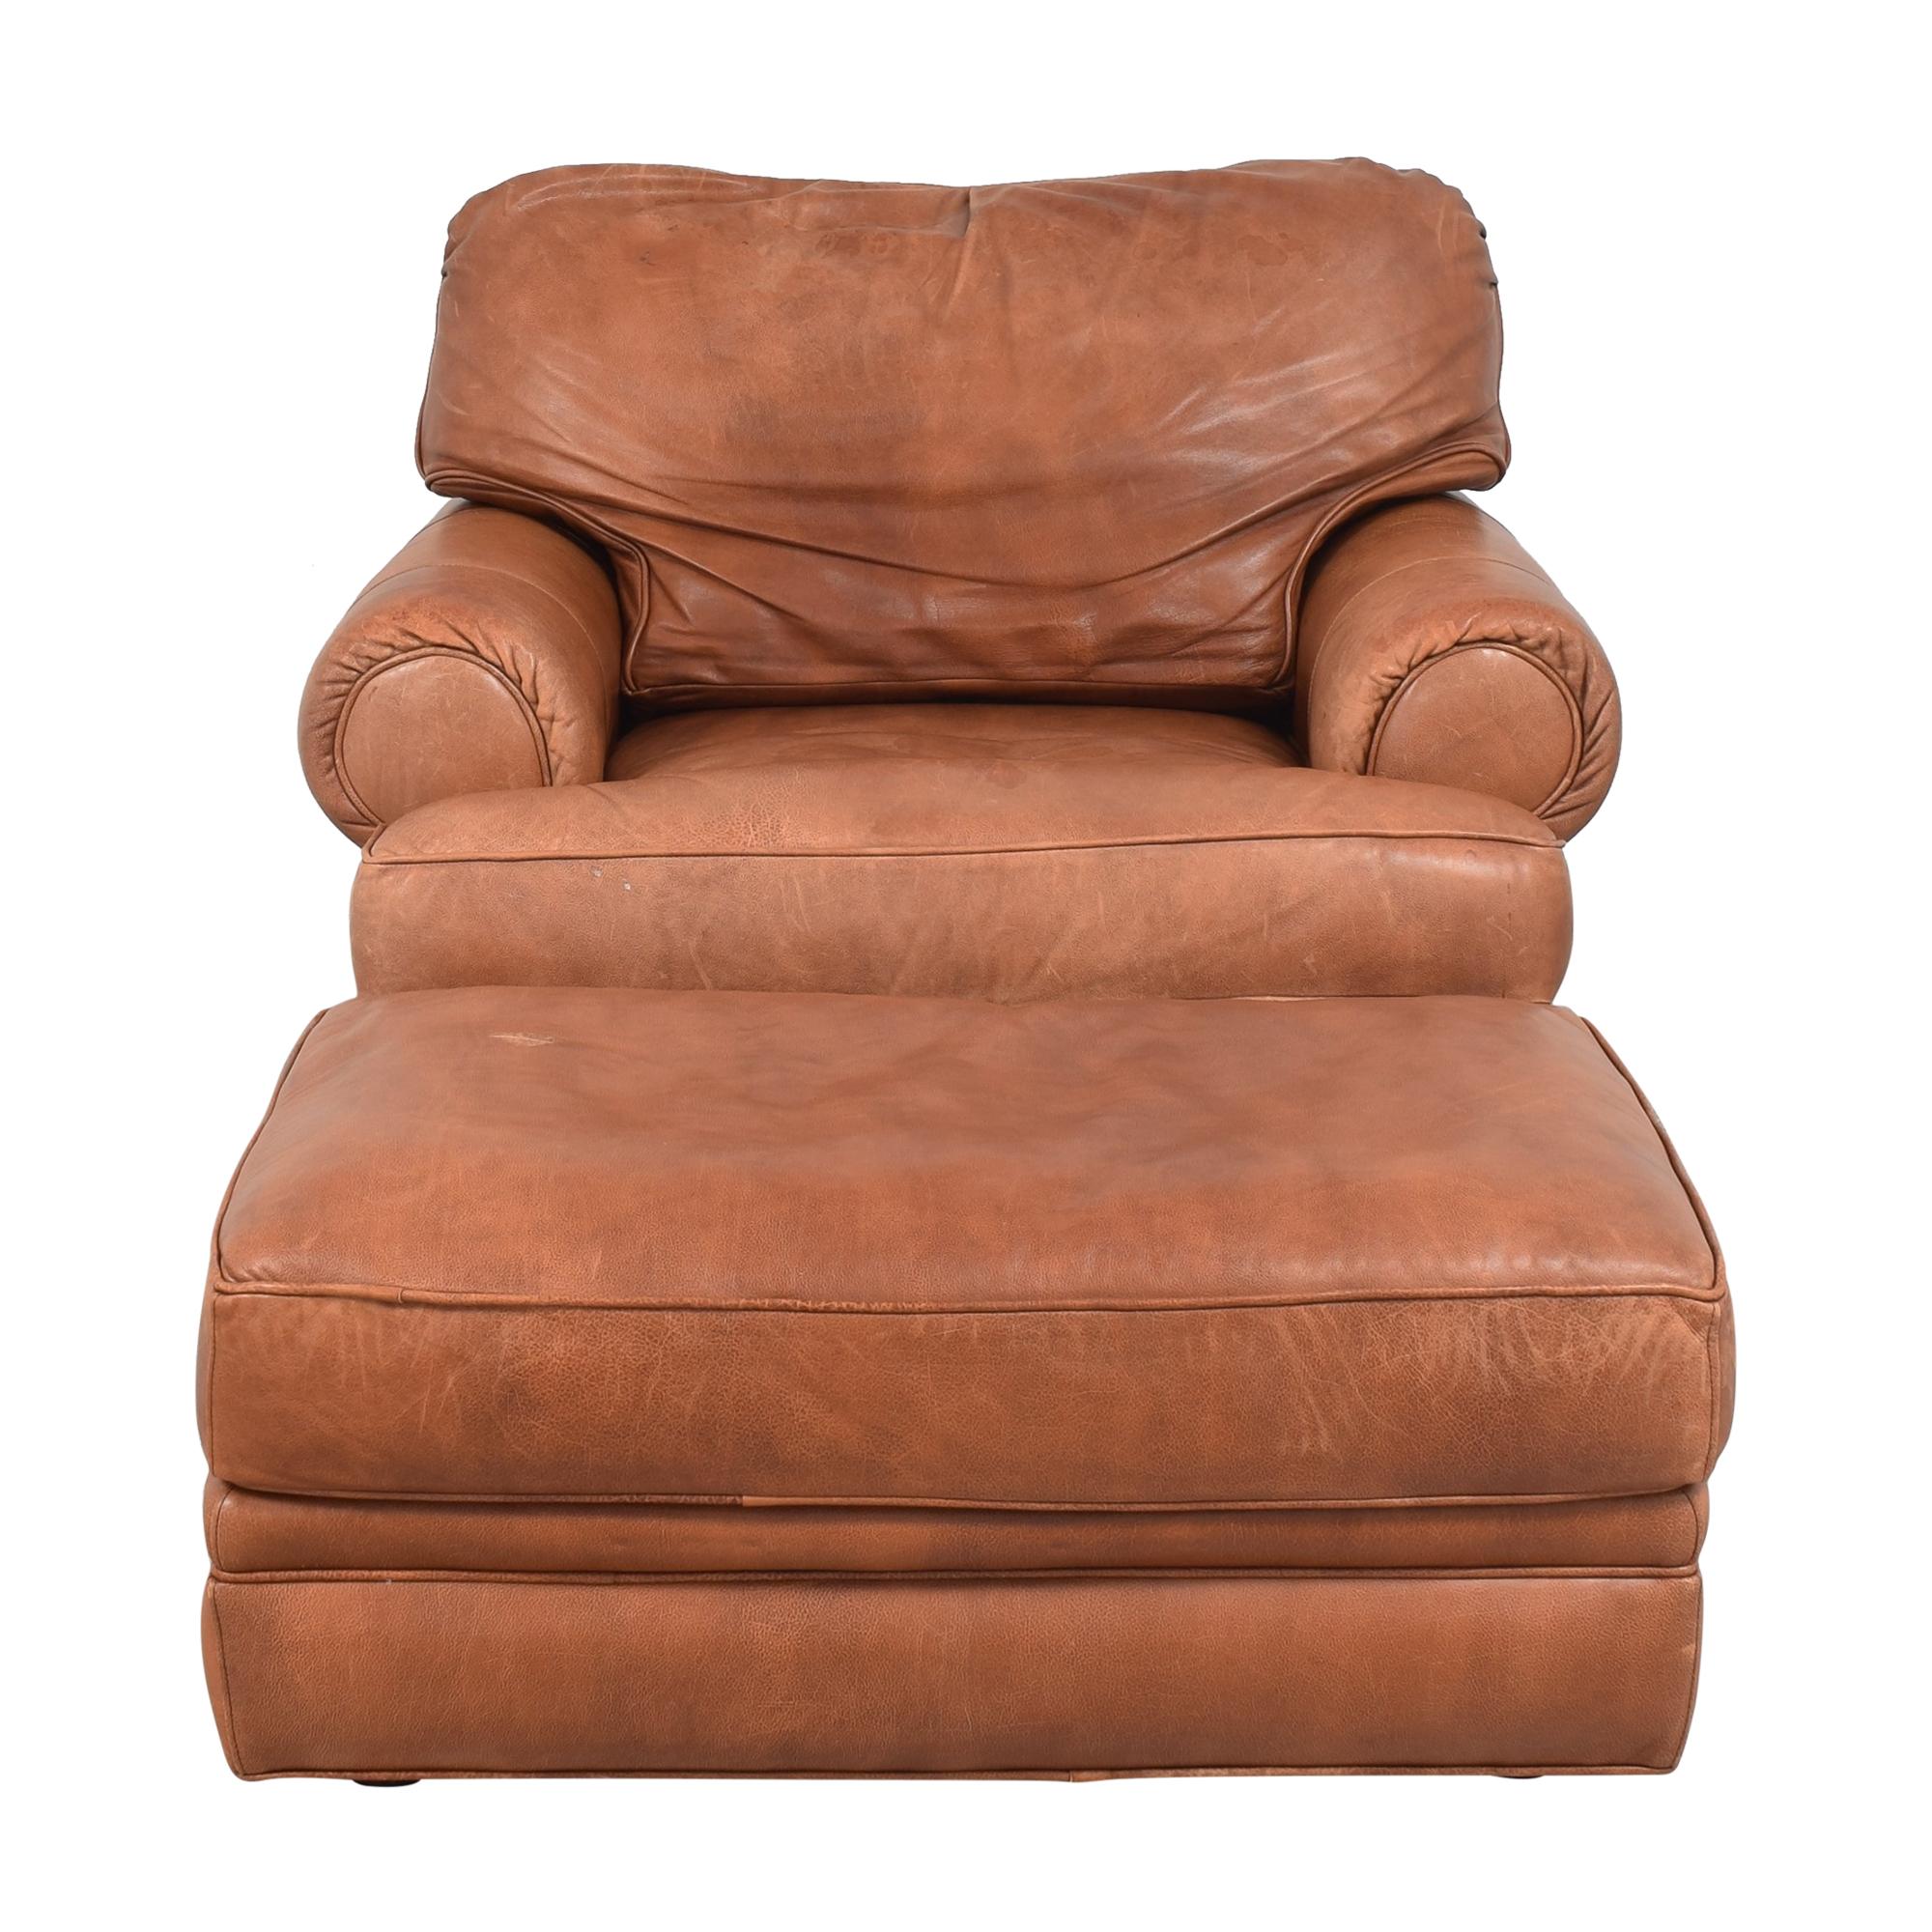 Lexington Furniture Lexington Club Chair with Ottoman brown